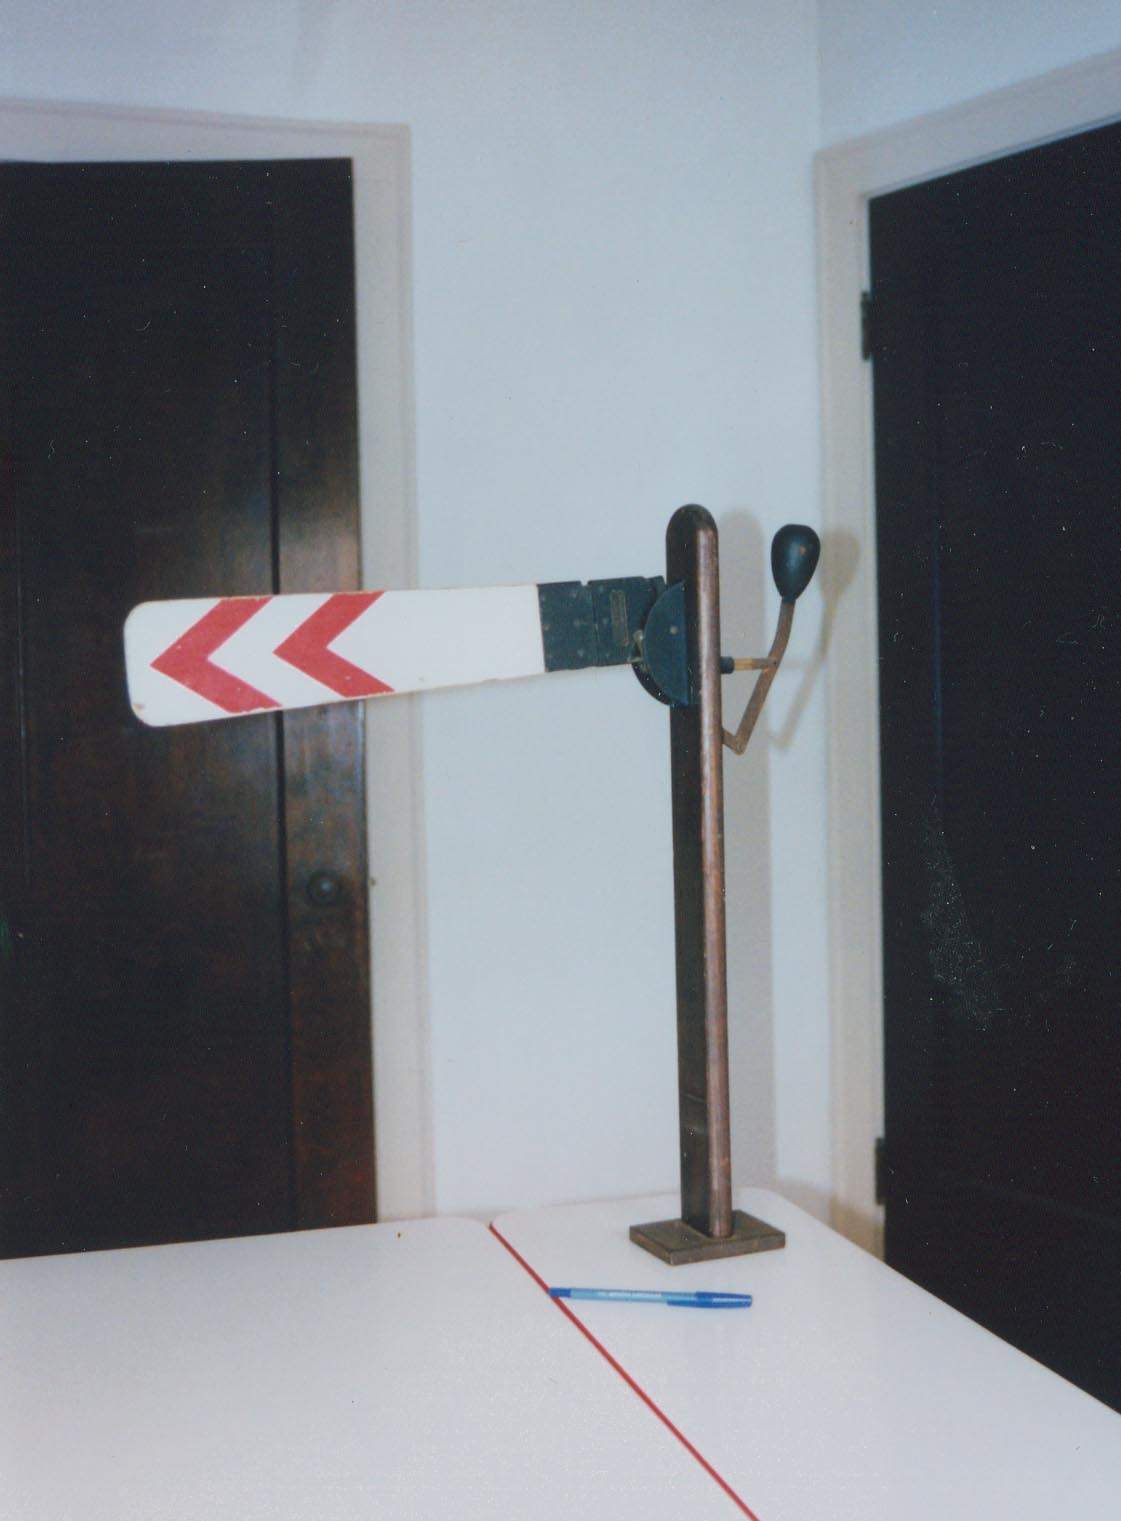 Villard Auto Signal Co. semaphore